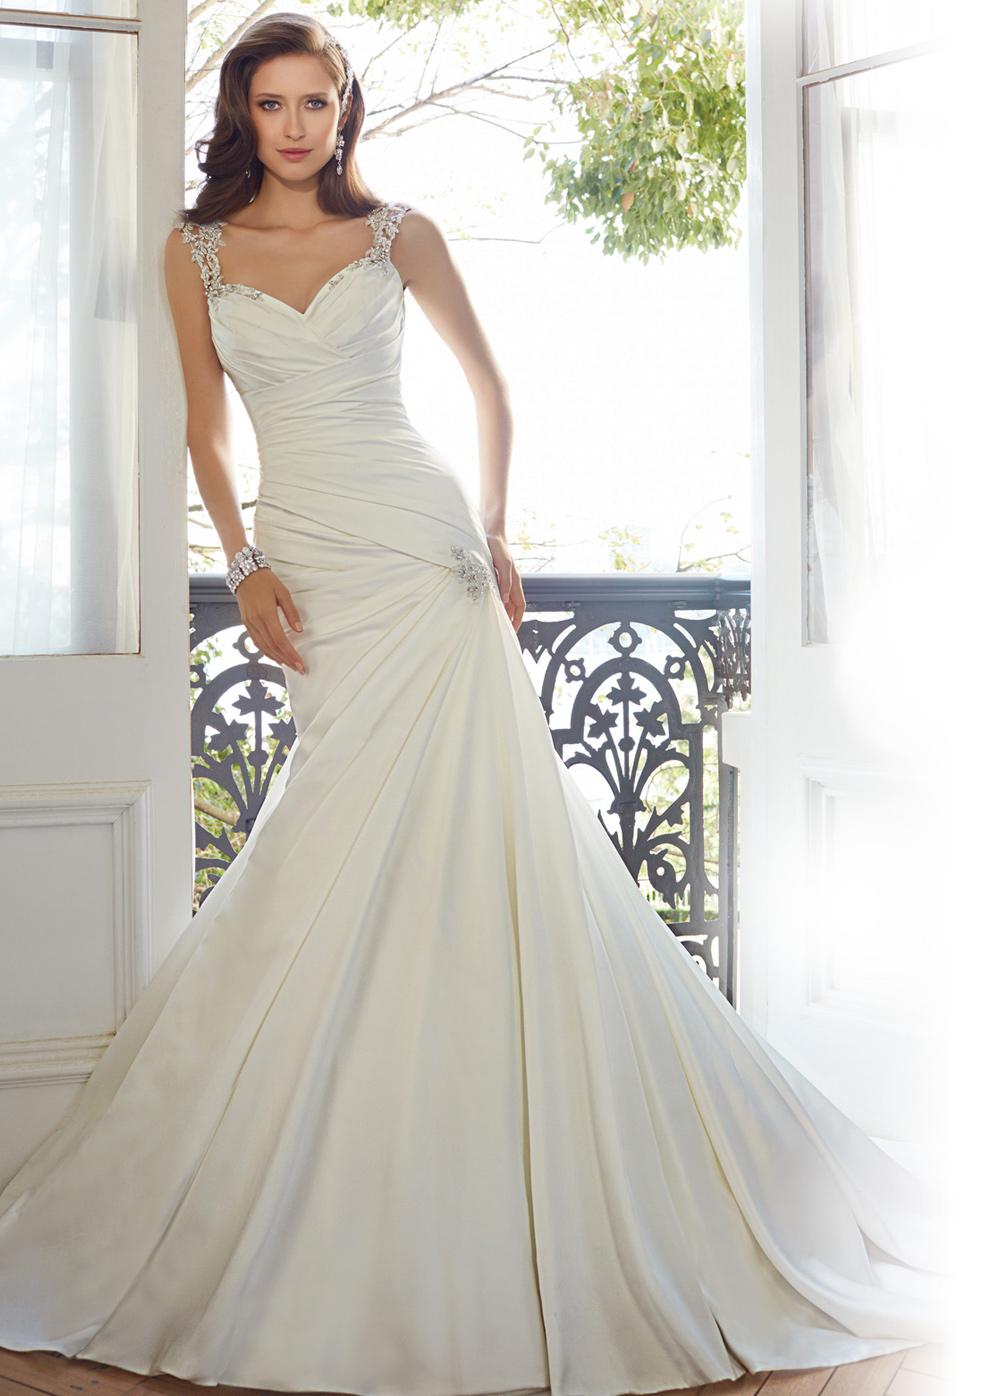 Vestido novia corte corazon